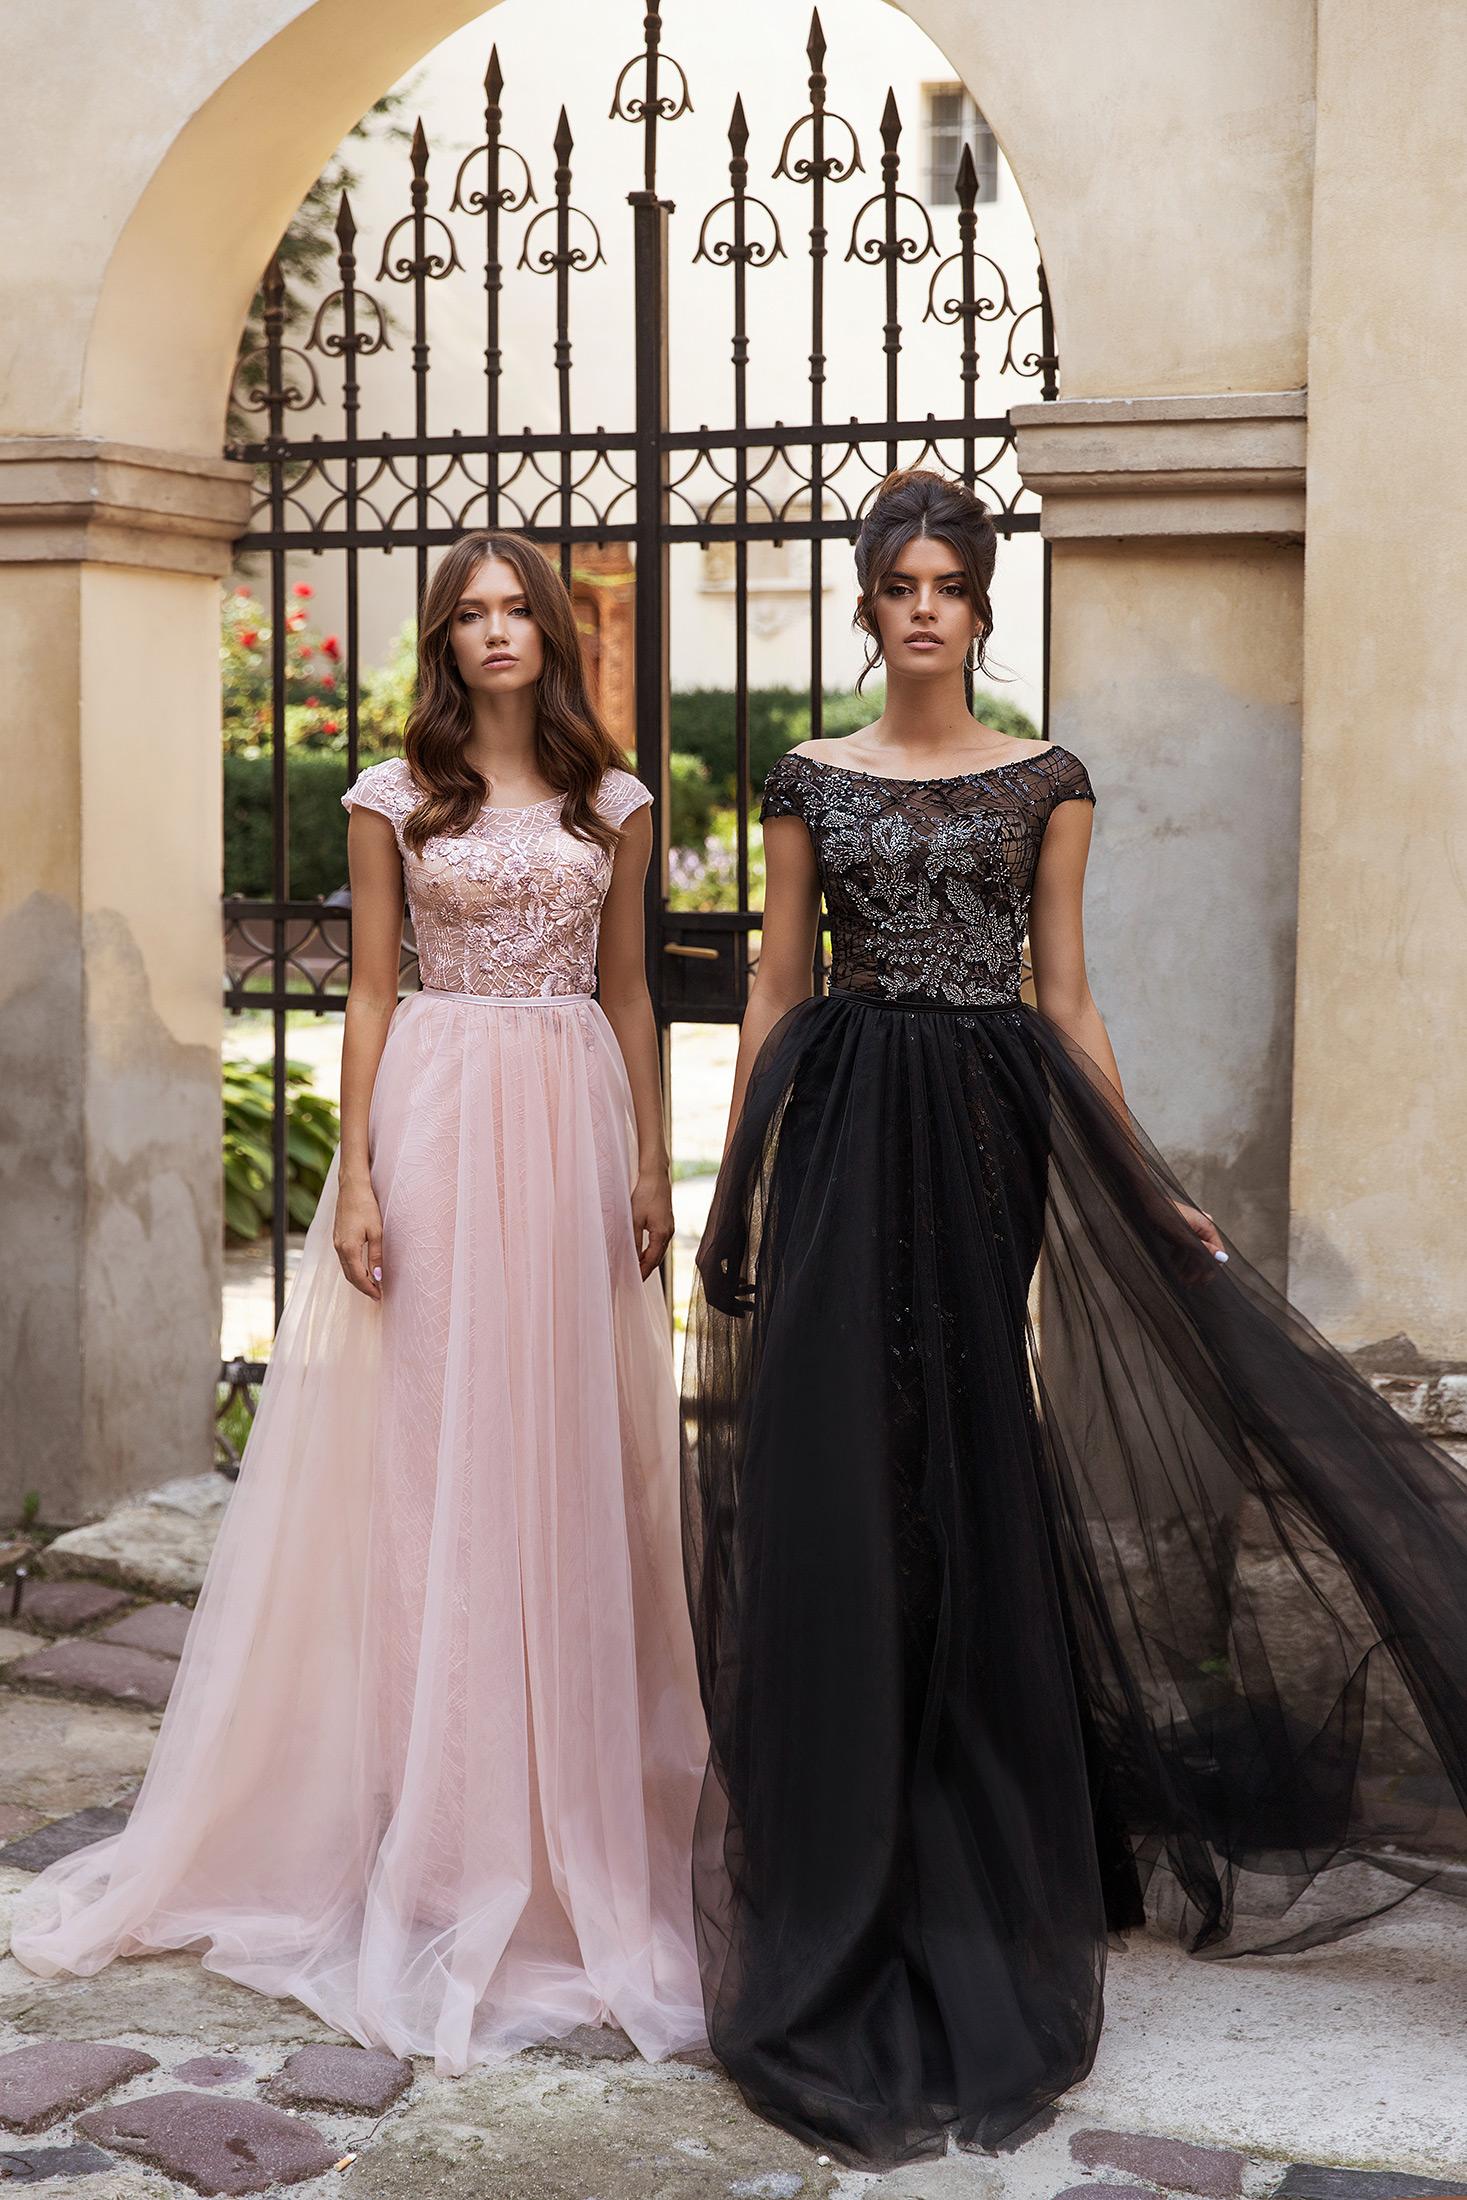 geneve robe fourreau sirène glitter tulle jupe amovible mariage soirée invitée chic sophistiquée noir strass